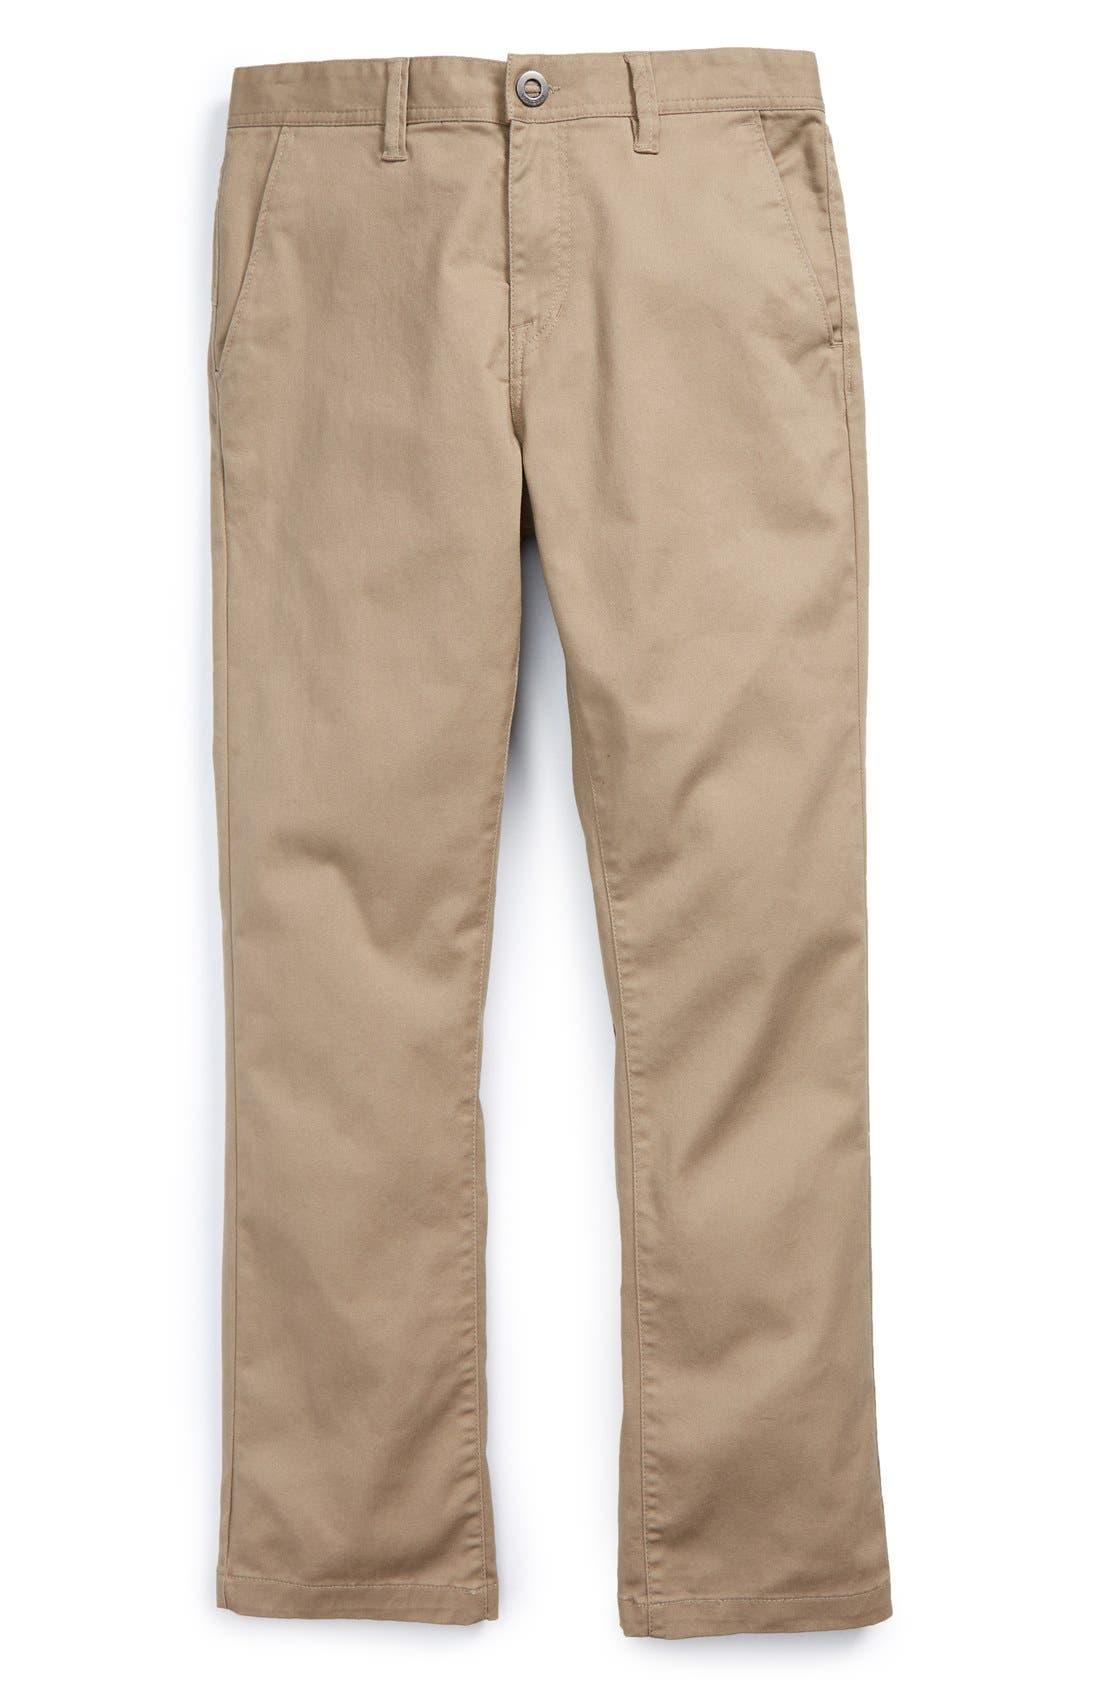 Boys Volcom Modern Stretch Chinos Size 30  Beige